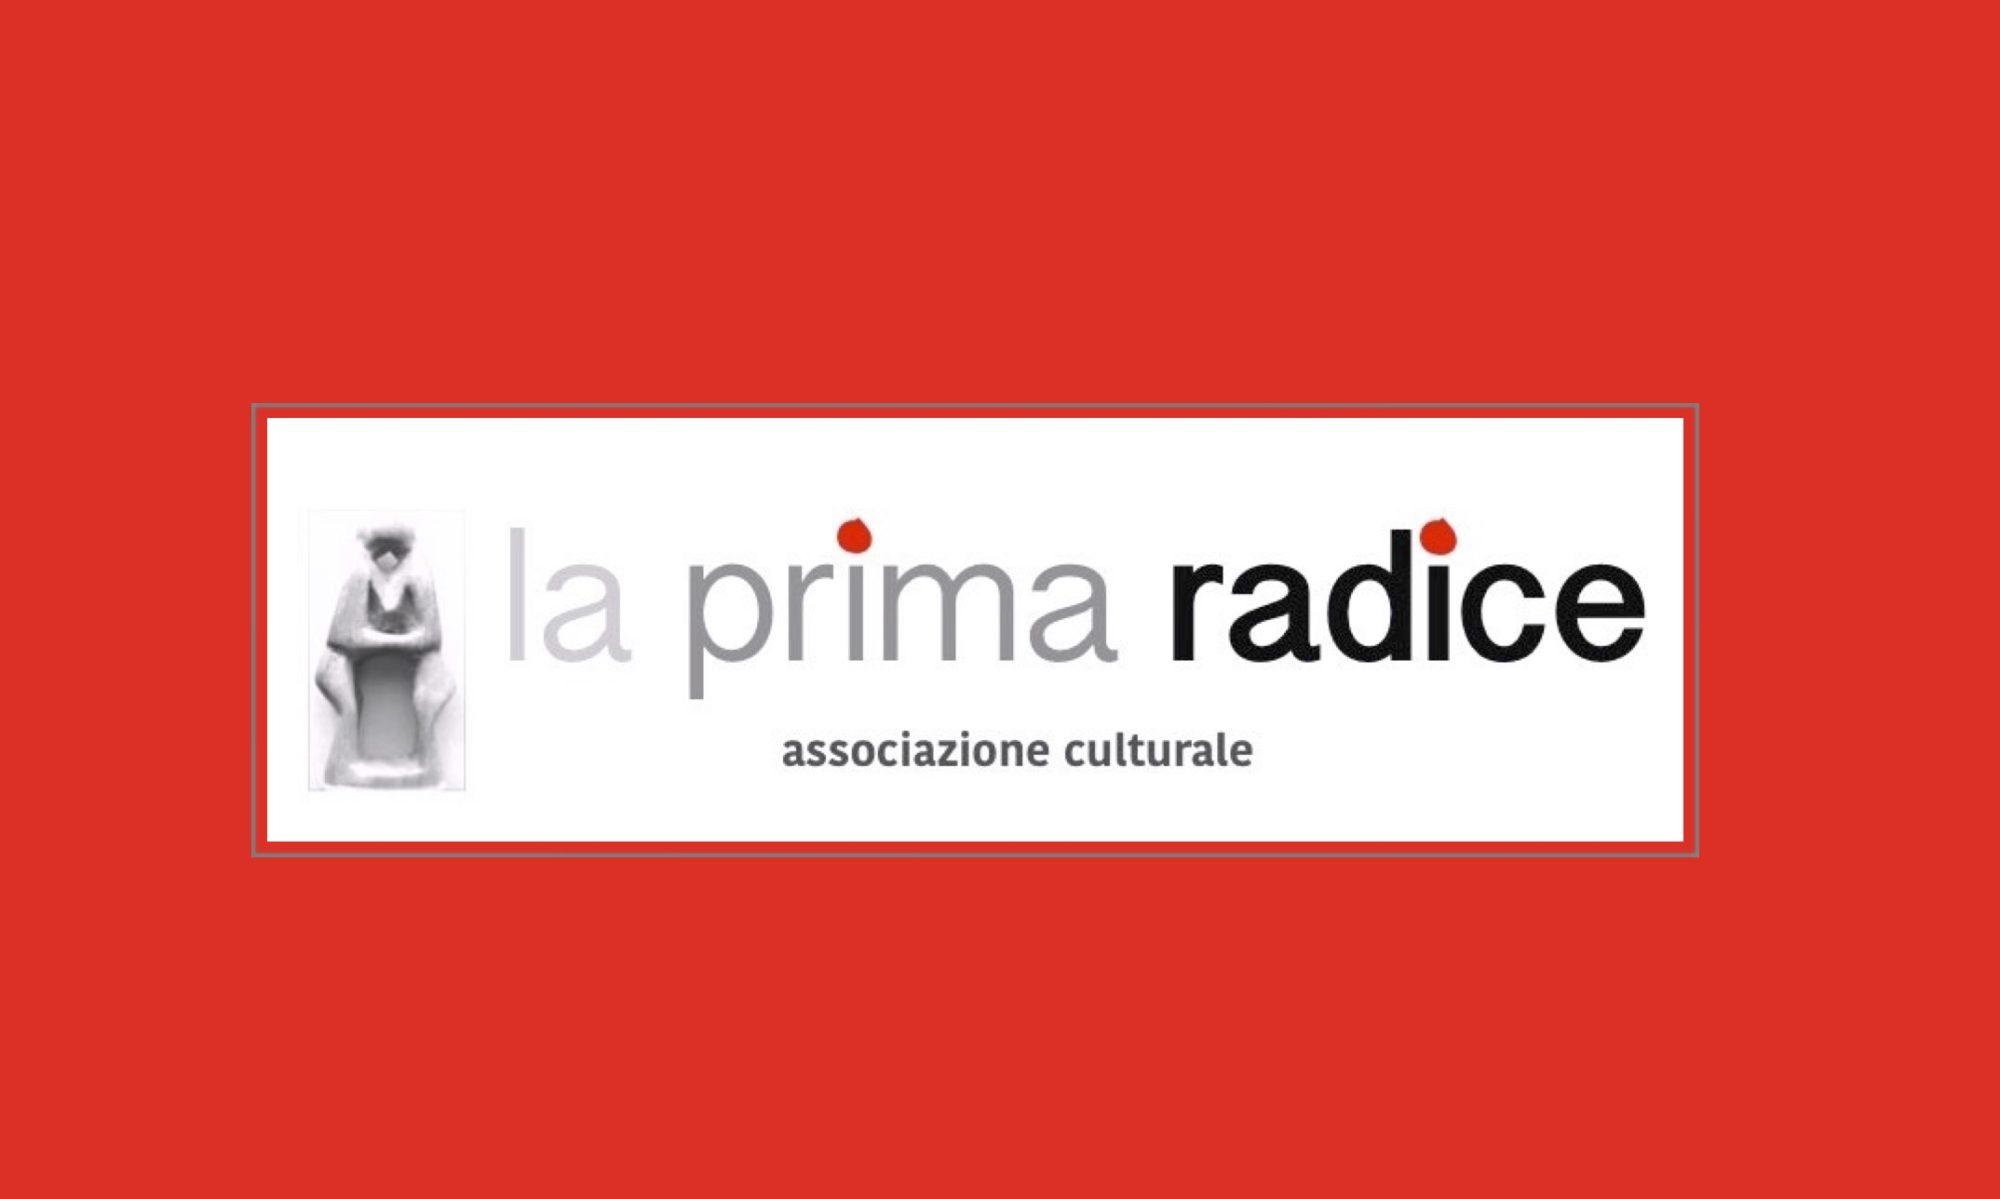 Associazione culturale la prima radice